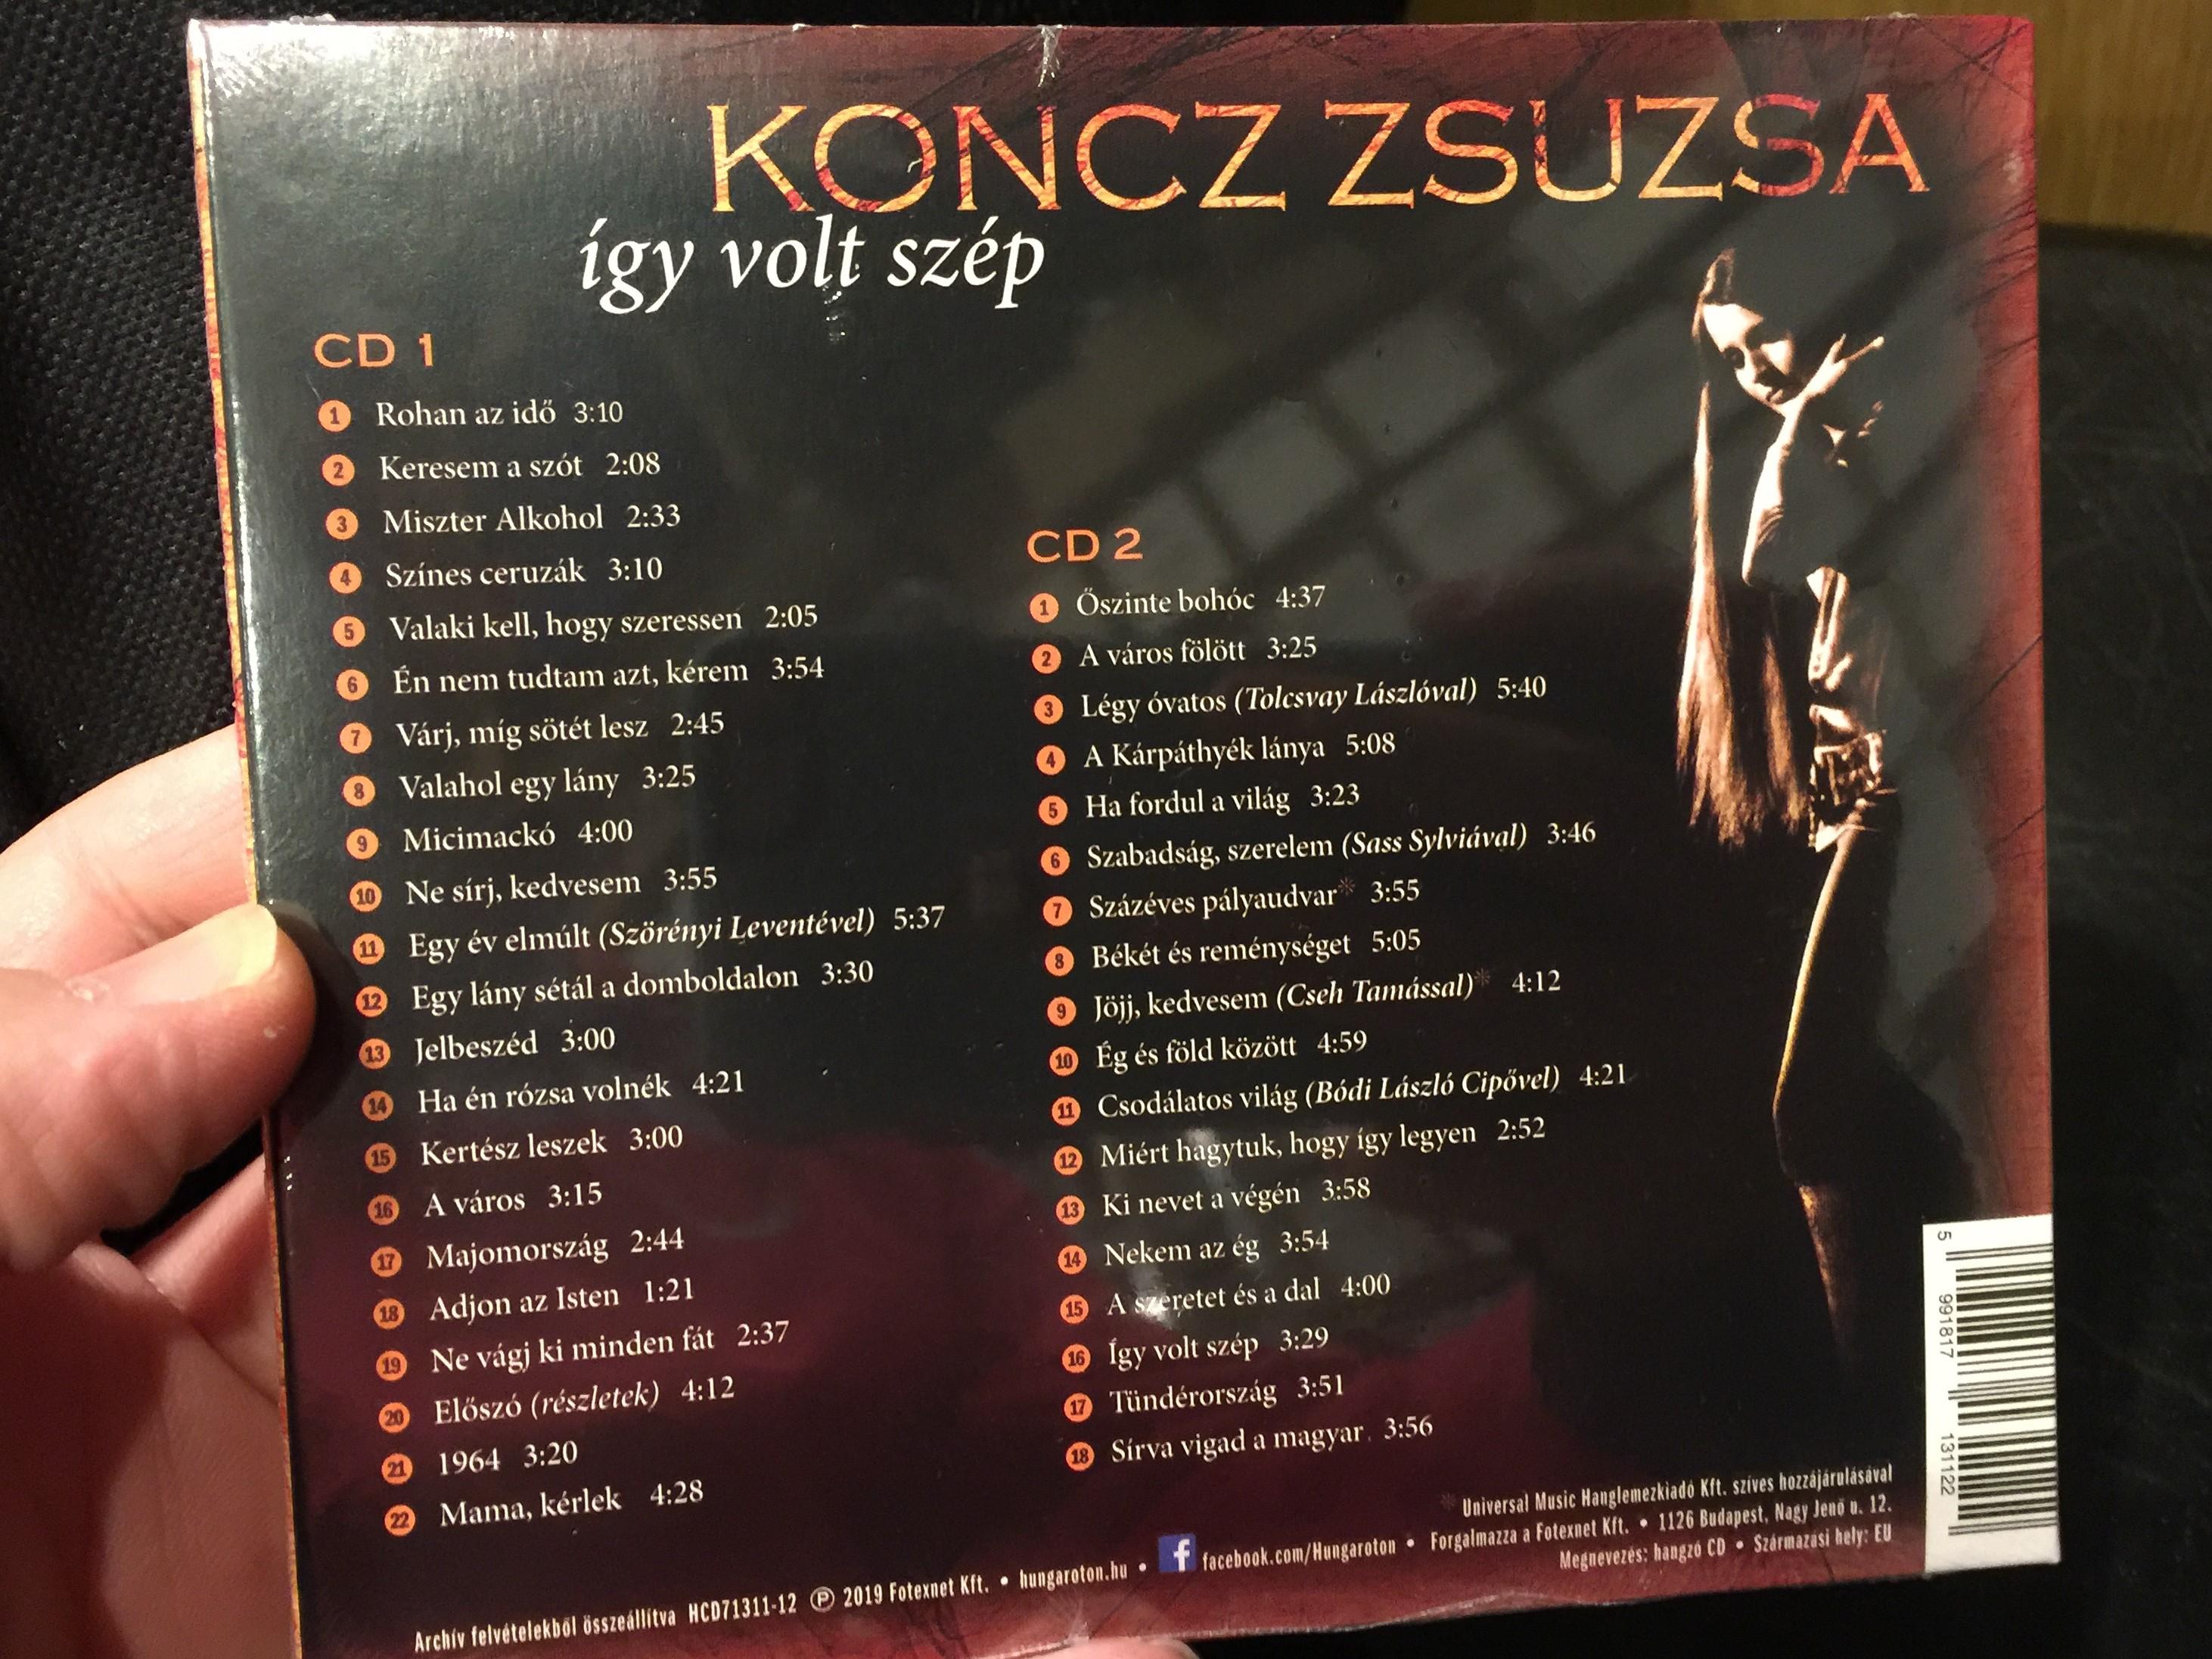 koncz-zsuzsa-gy-volt-sz-p-2cd-2-.jpg